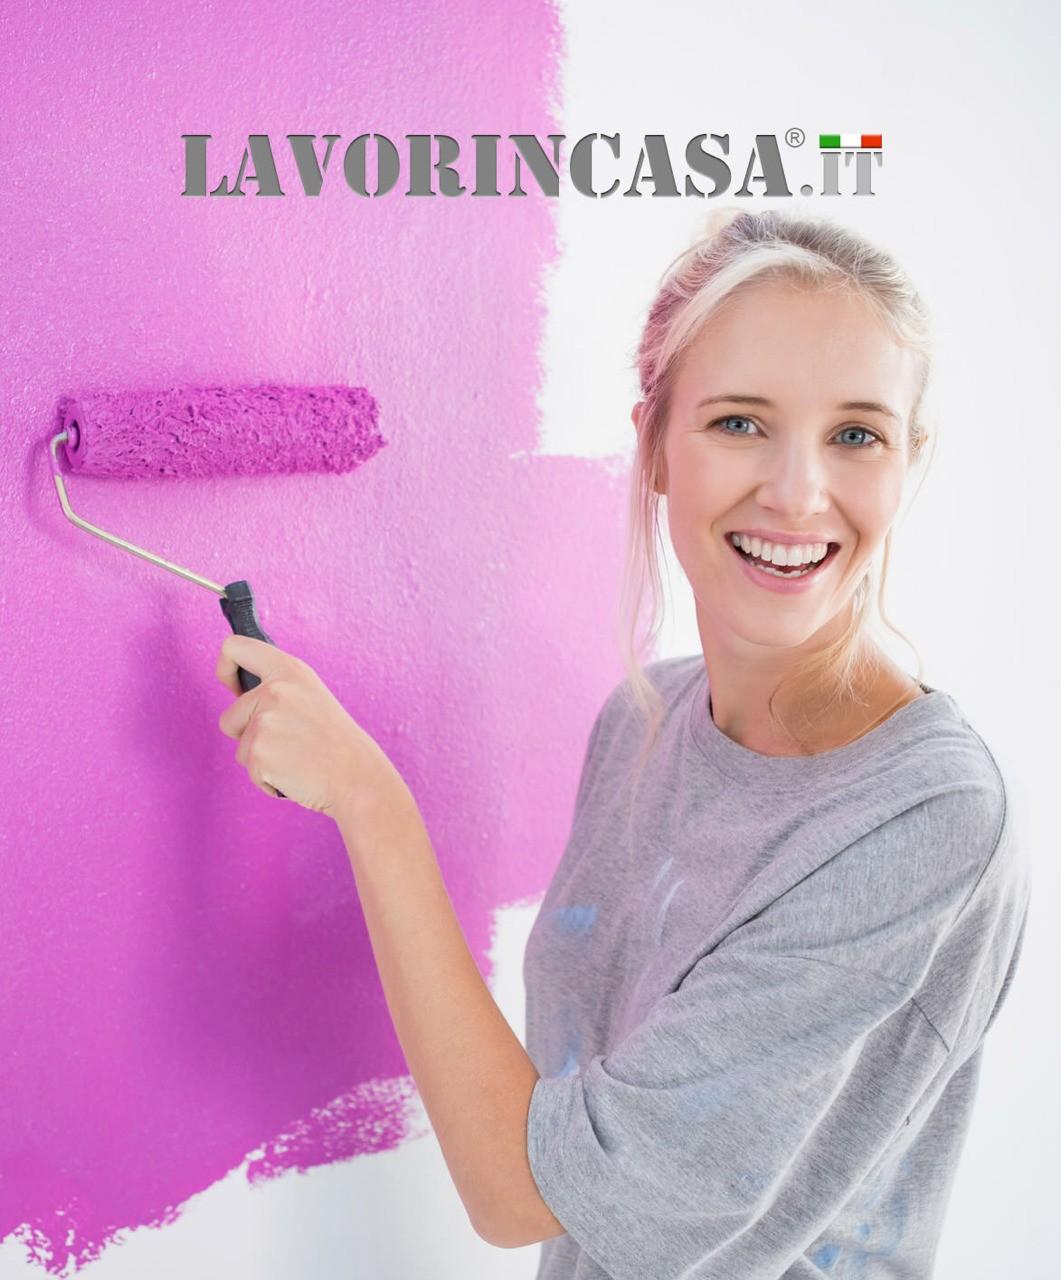 Lavorincasa.it - cover